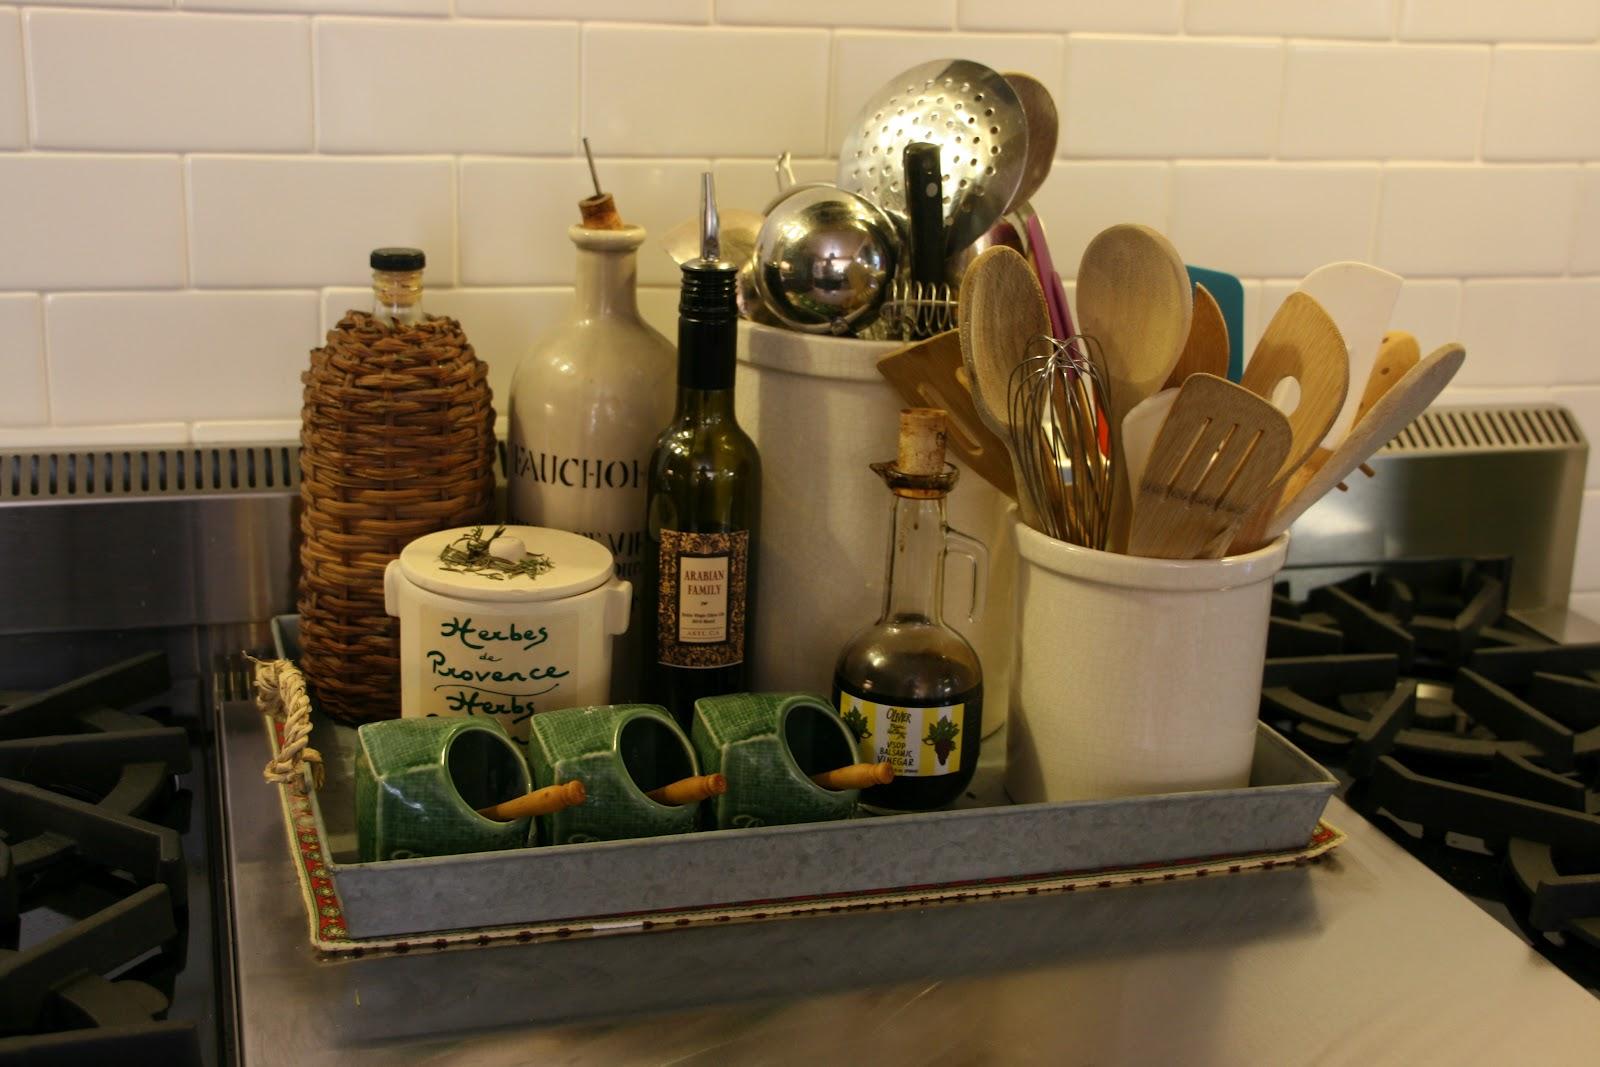 vignette design getting organized in the kitchen. Black Bedroom Furniture Sets. Home Design Ideas